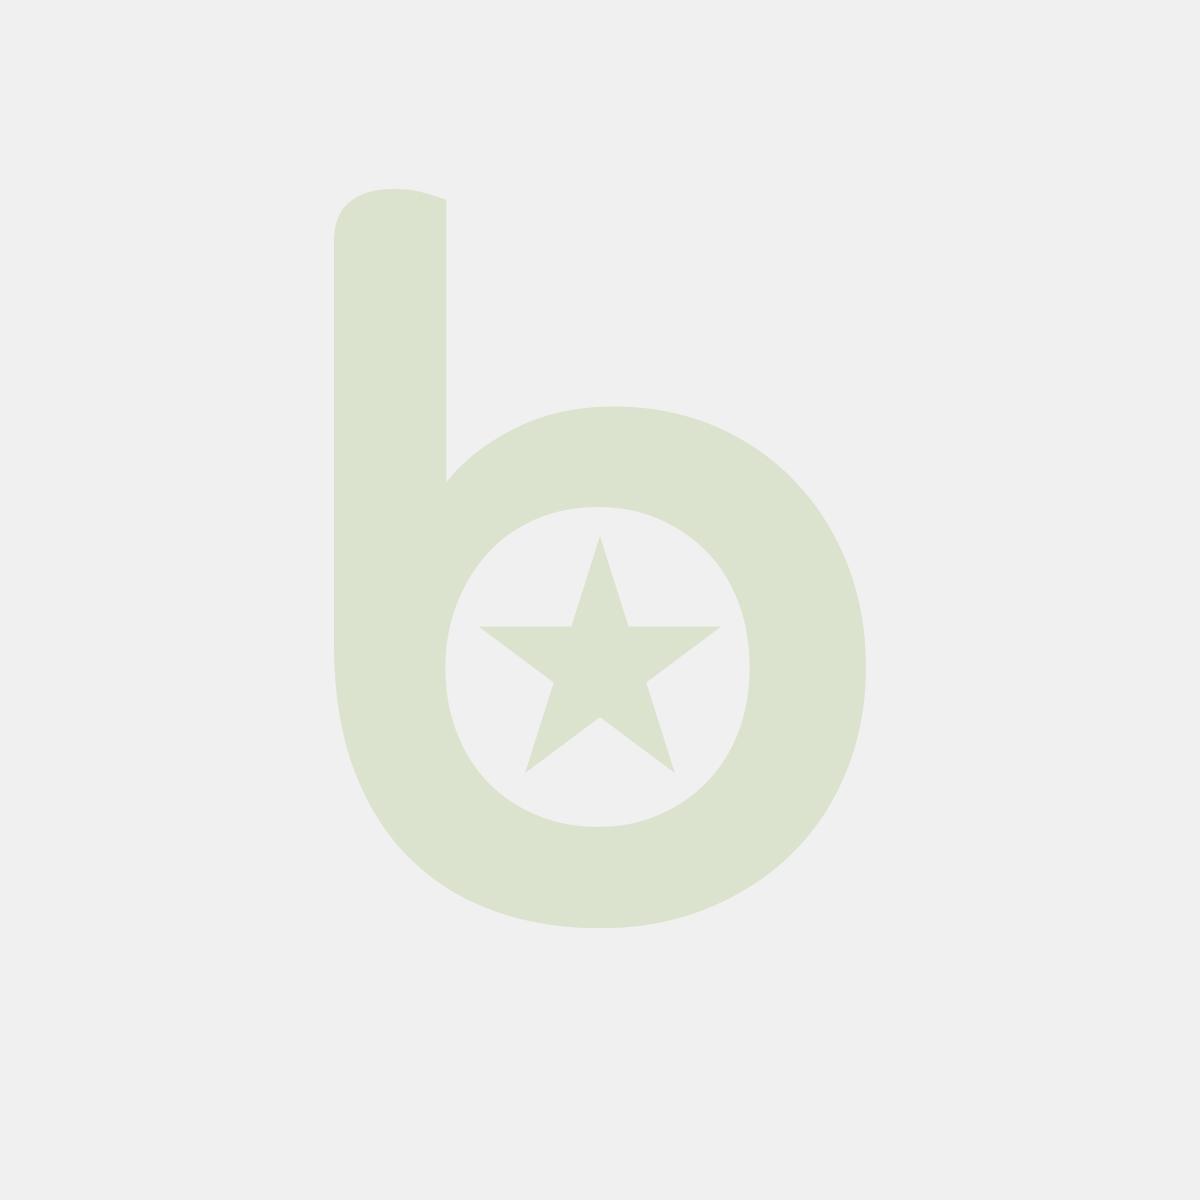 FINGERFOOD - pucharek SAKE 100ml transparentny fi.7,4xh.4cm op. 50 sztuk